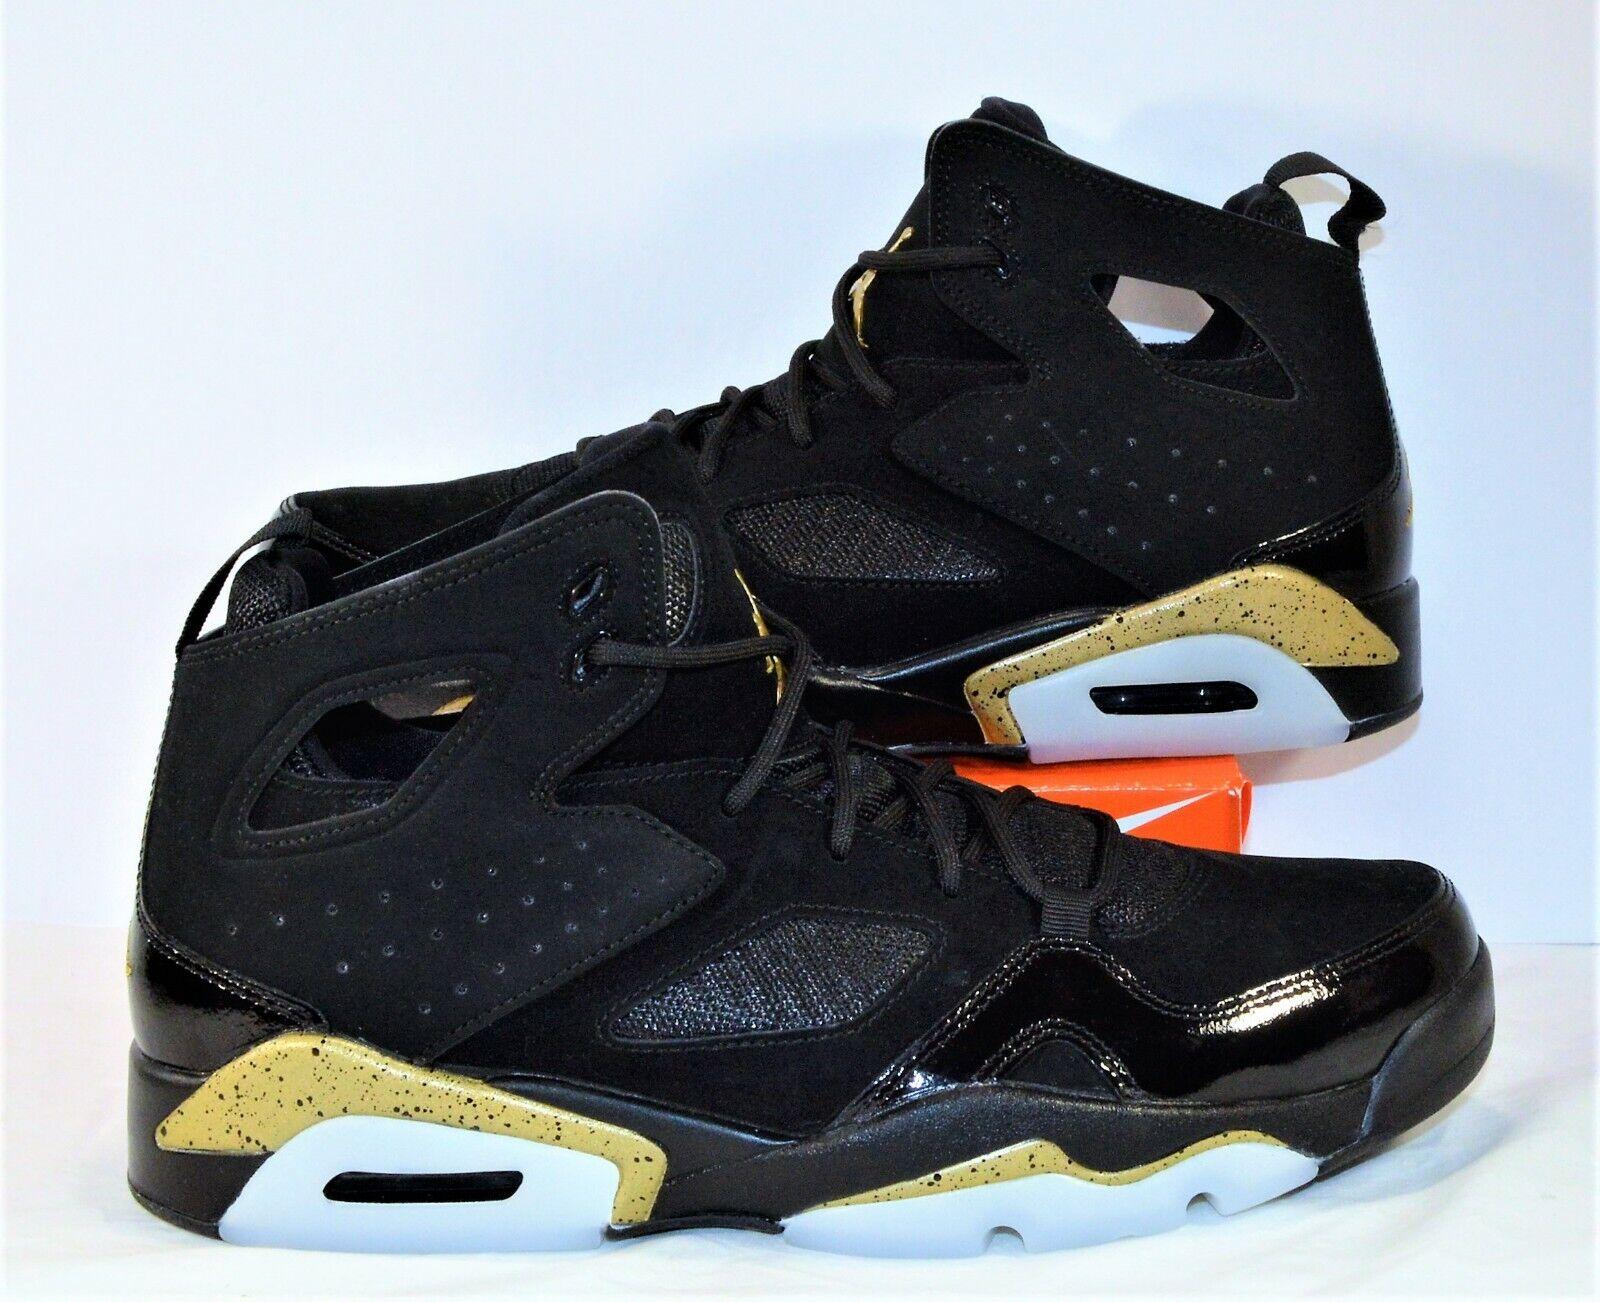 a75d8480ccf Nike Jordan Fight Club 91 Black gold Basketball shoes Sz 9.5 NEW 555475 031  Air ndxsdv3783-Athletic Shoes